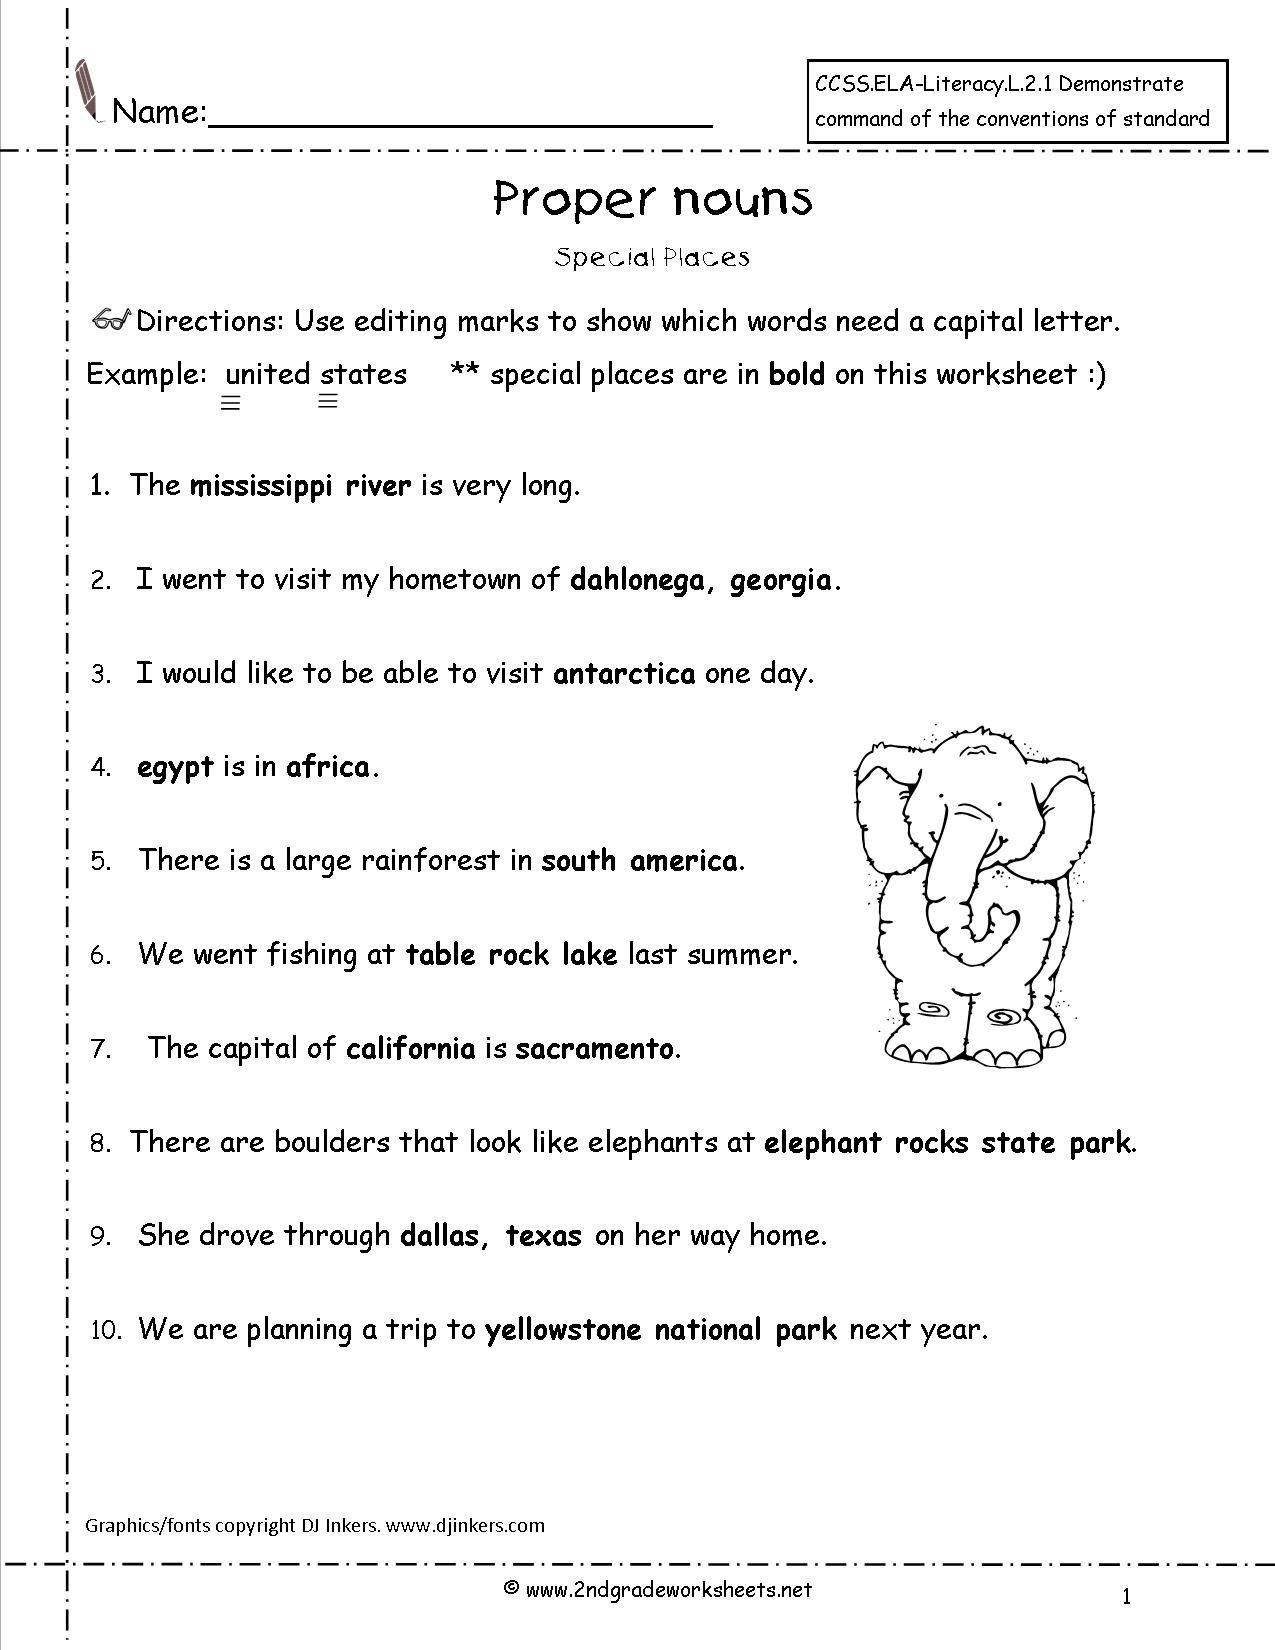 2nd Grade Proper Nouns Worksheet Mon Noun and Proper Noun Worksheet for Grade 4